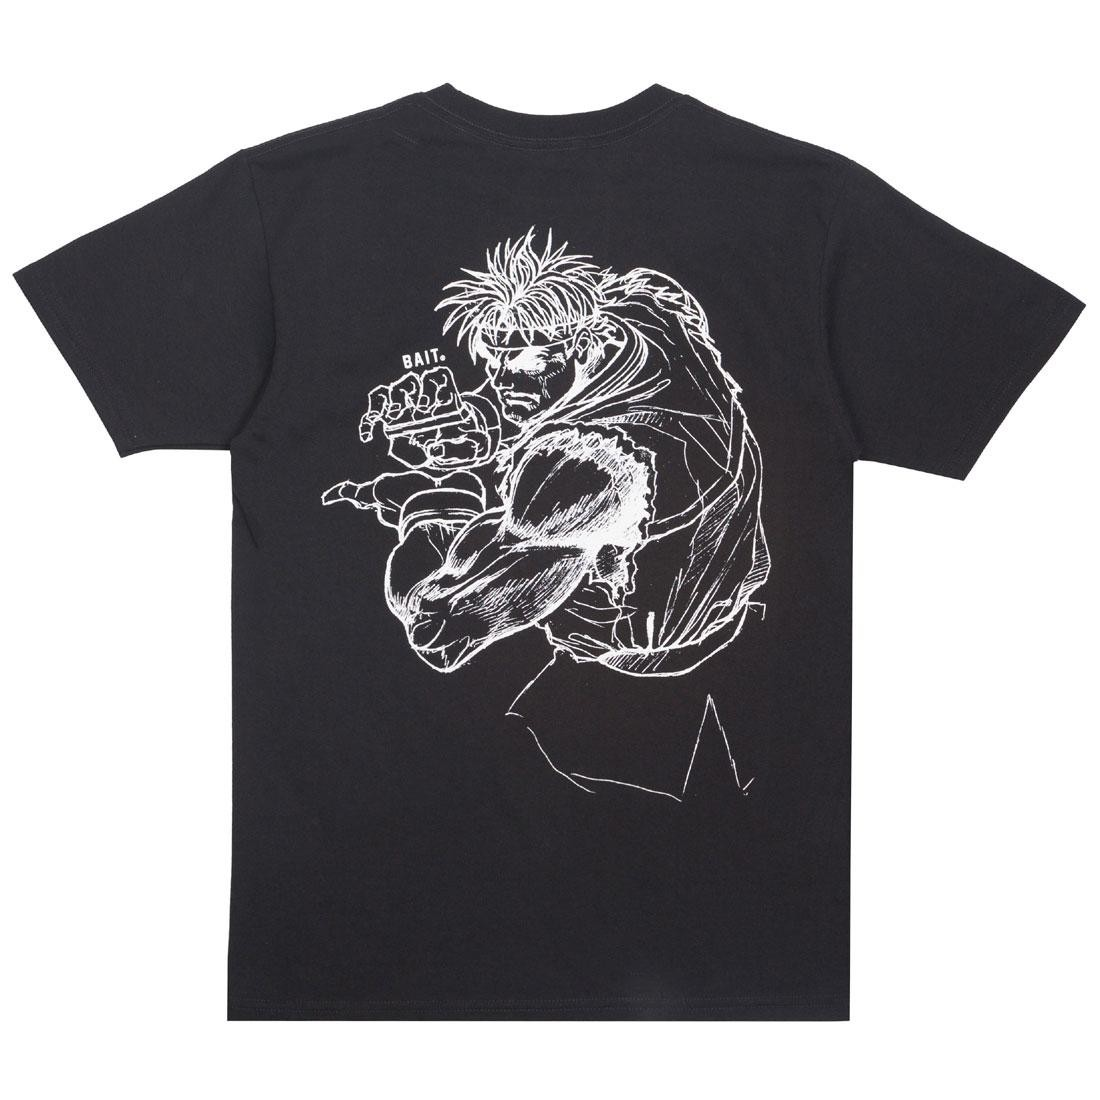 BAIT x Street Fighter Men Ryu Sketch Tee (black)